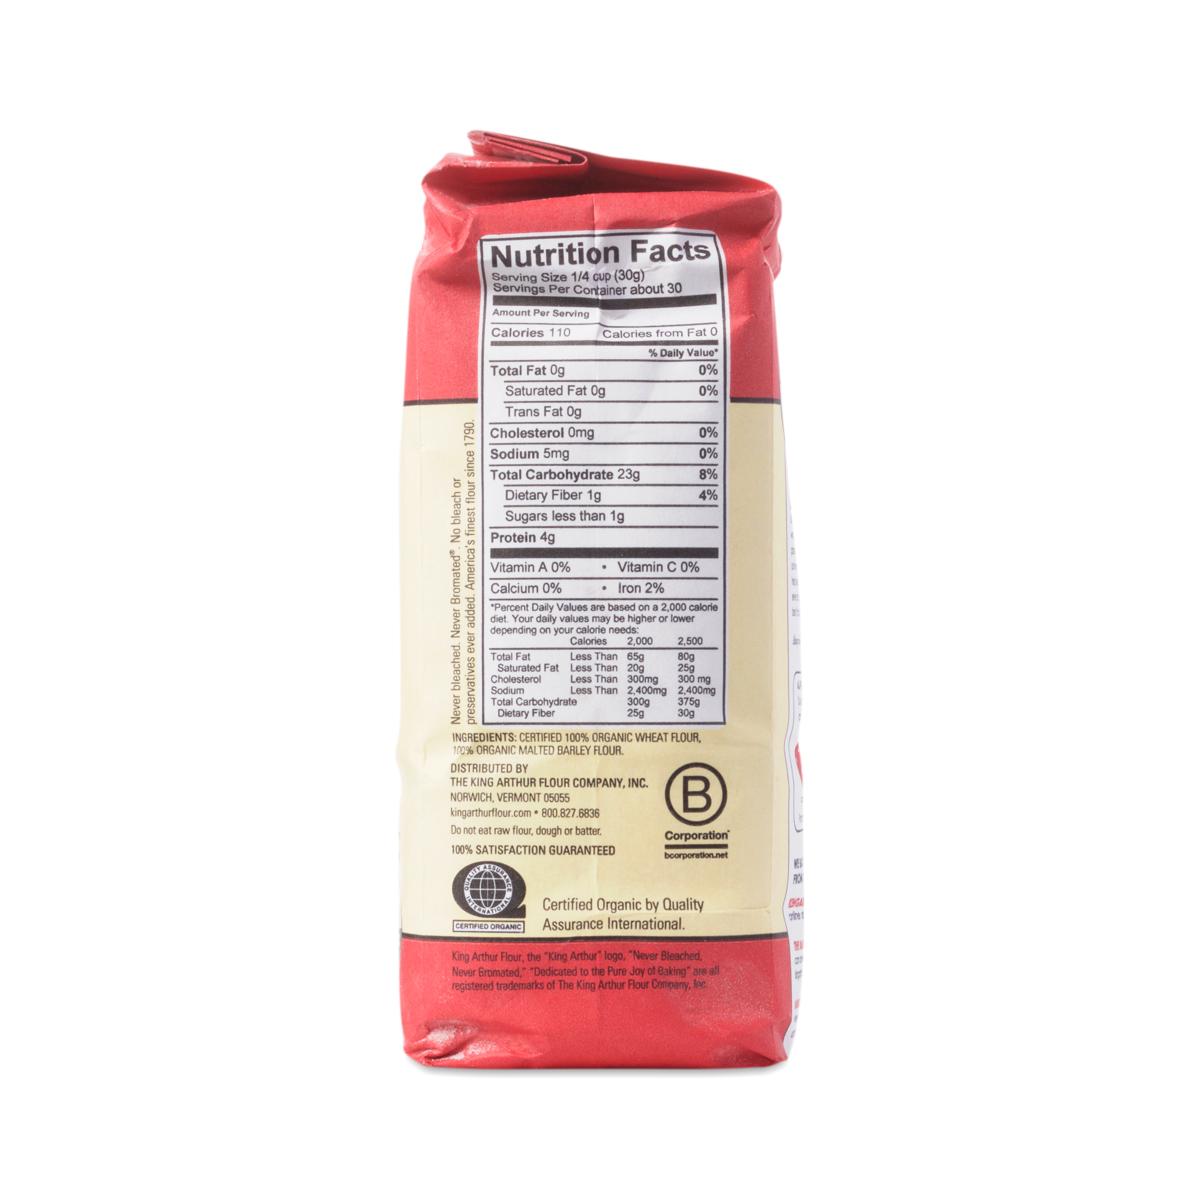 Organic, Unbleached All-Purpose Flour